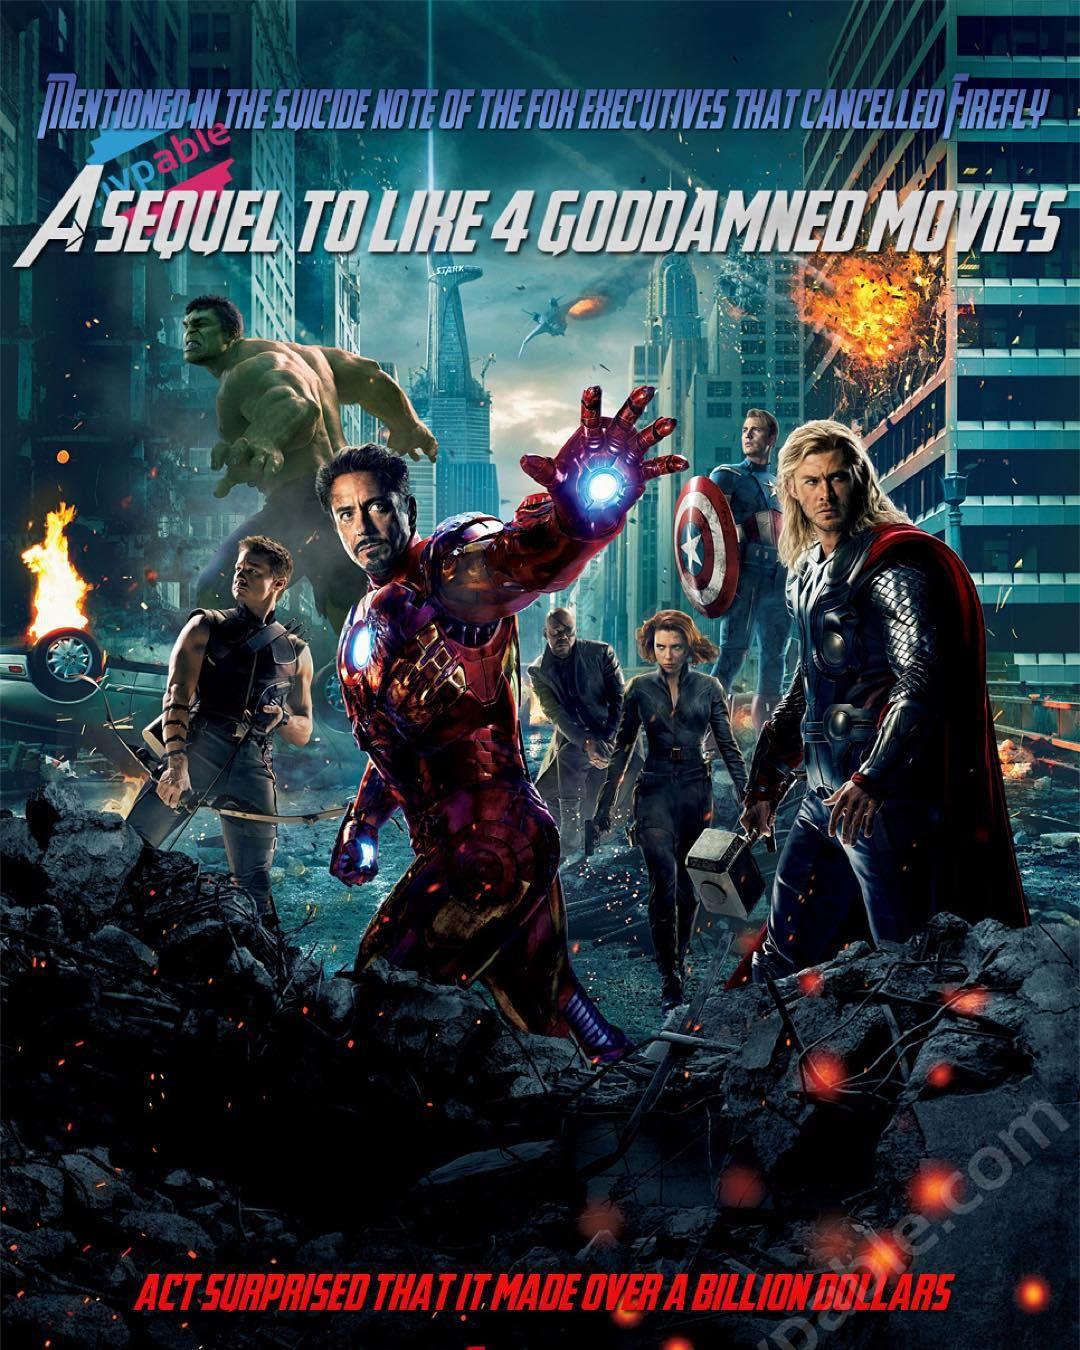 Funny movie posters  #movie #poster #funny #parody